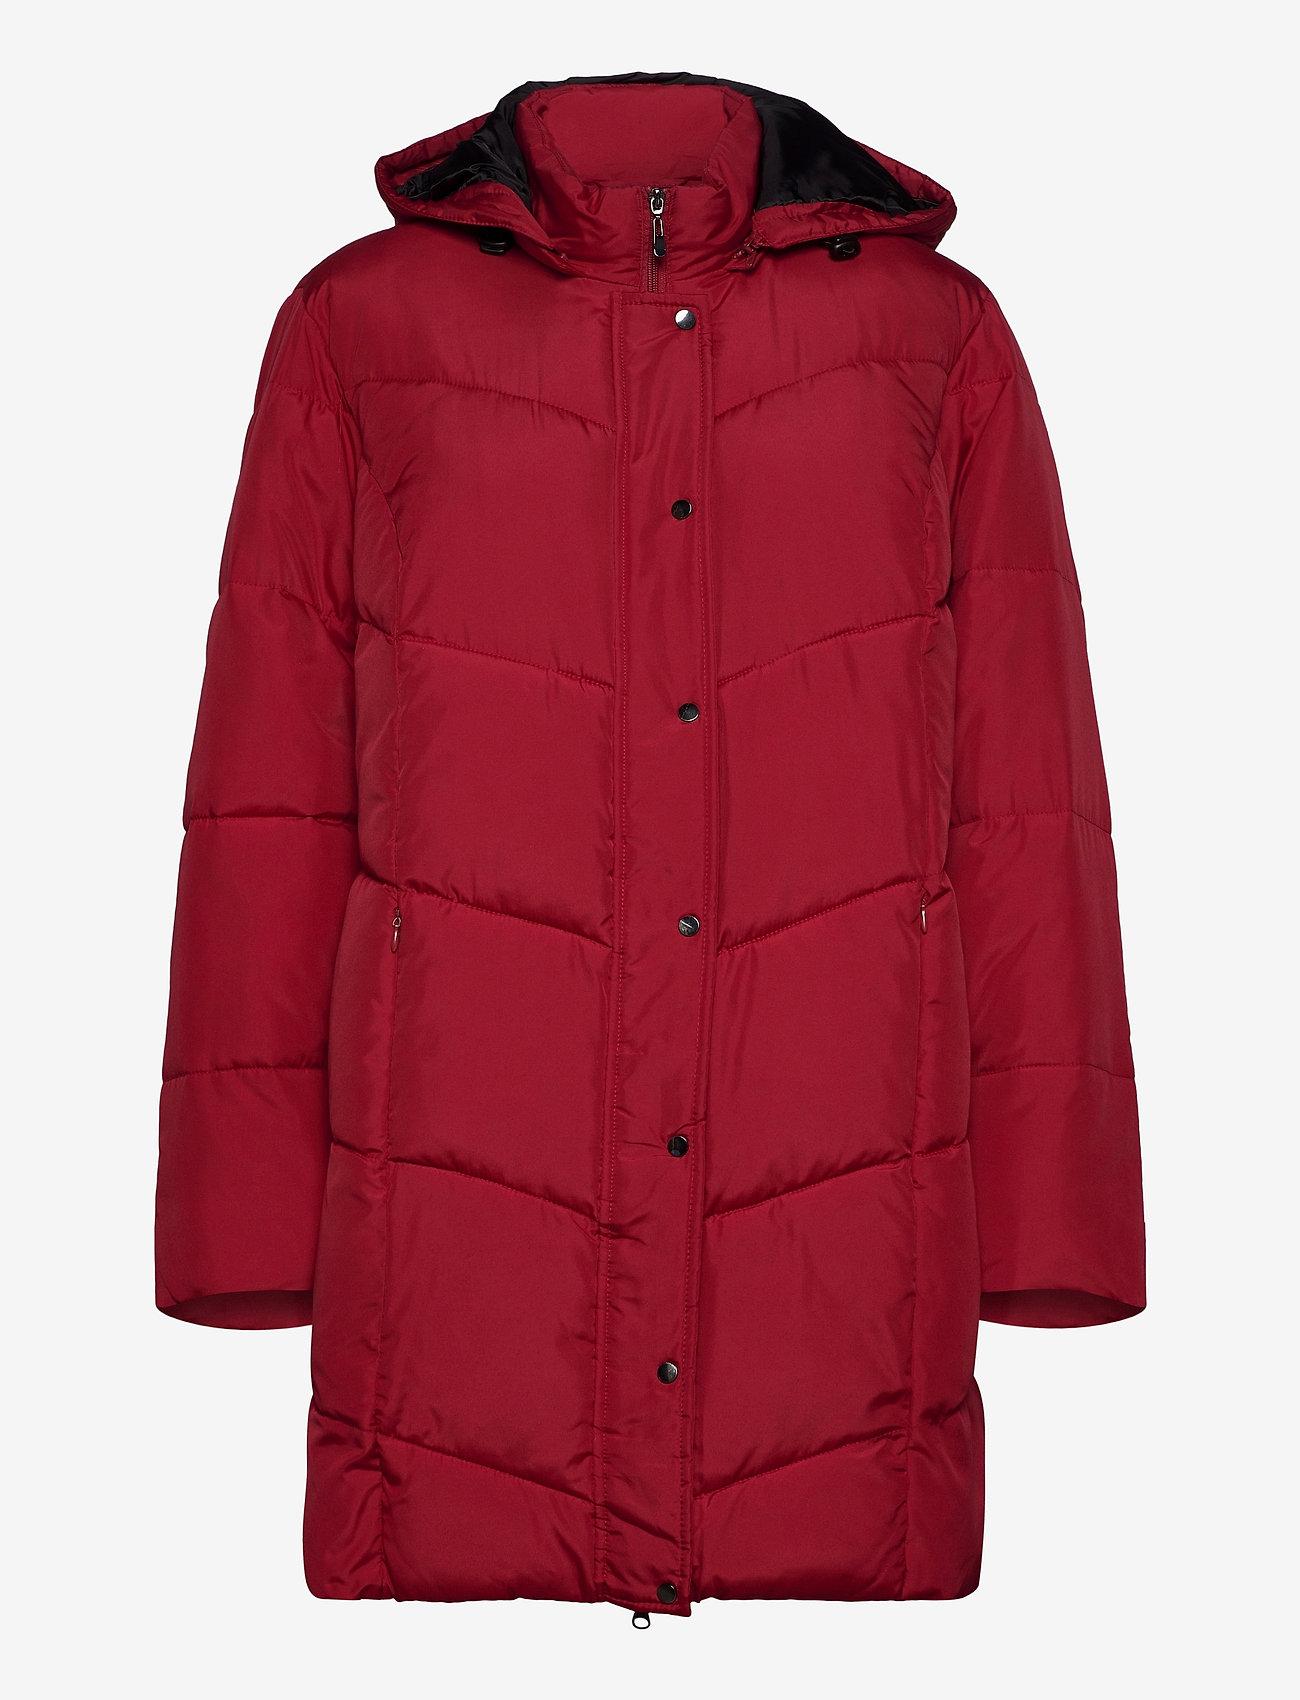 Brandtex - Coat Outerwear Heavy - dynefrakke - red - 1